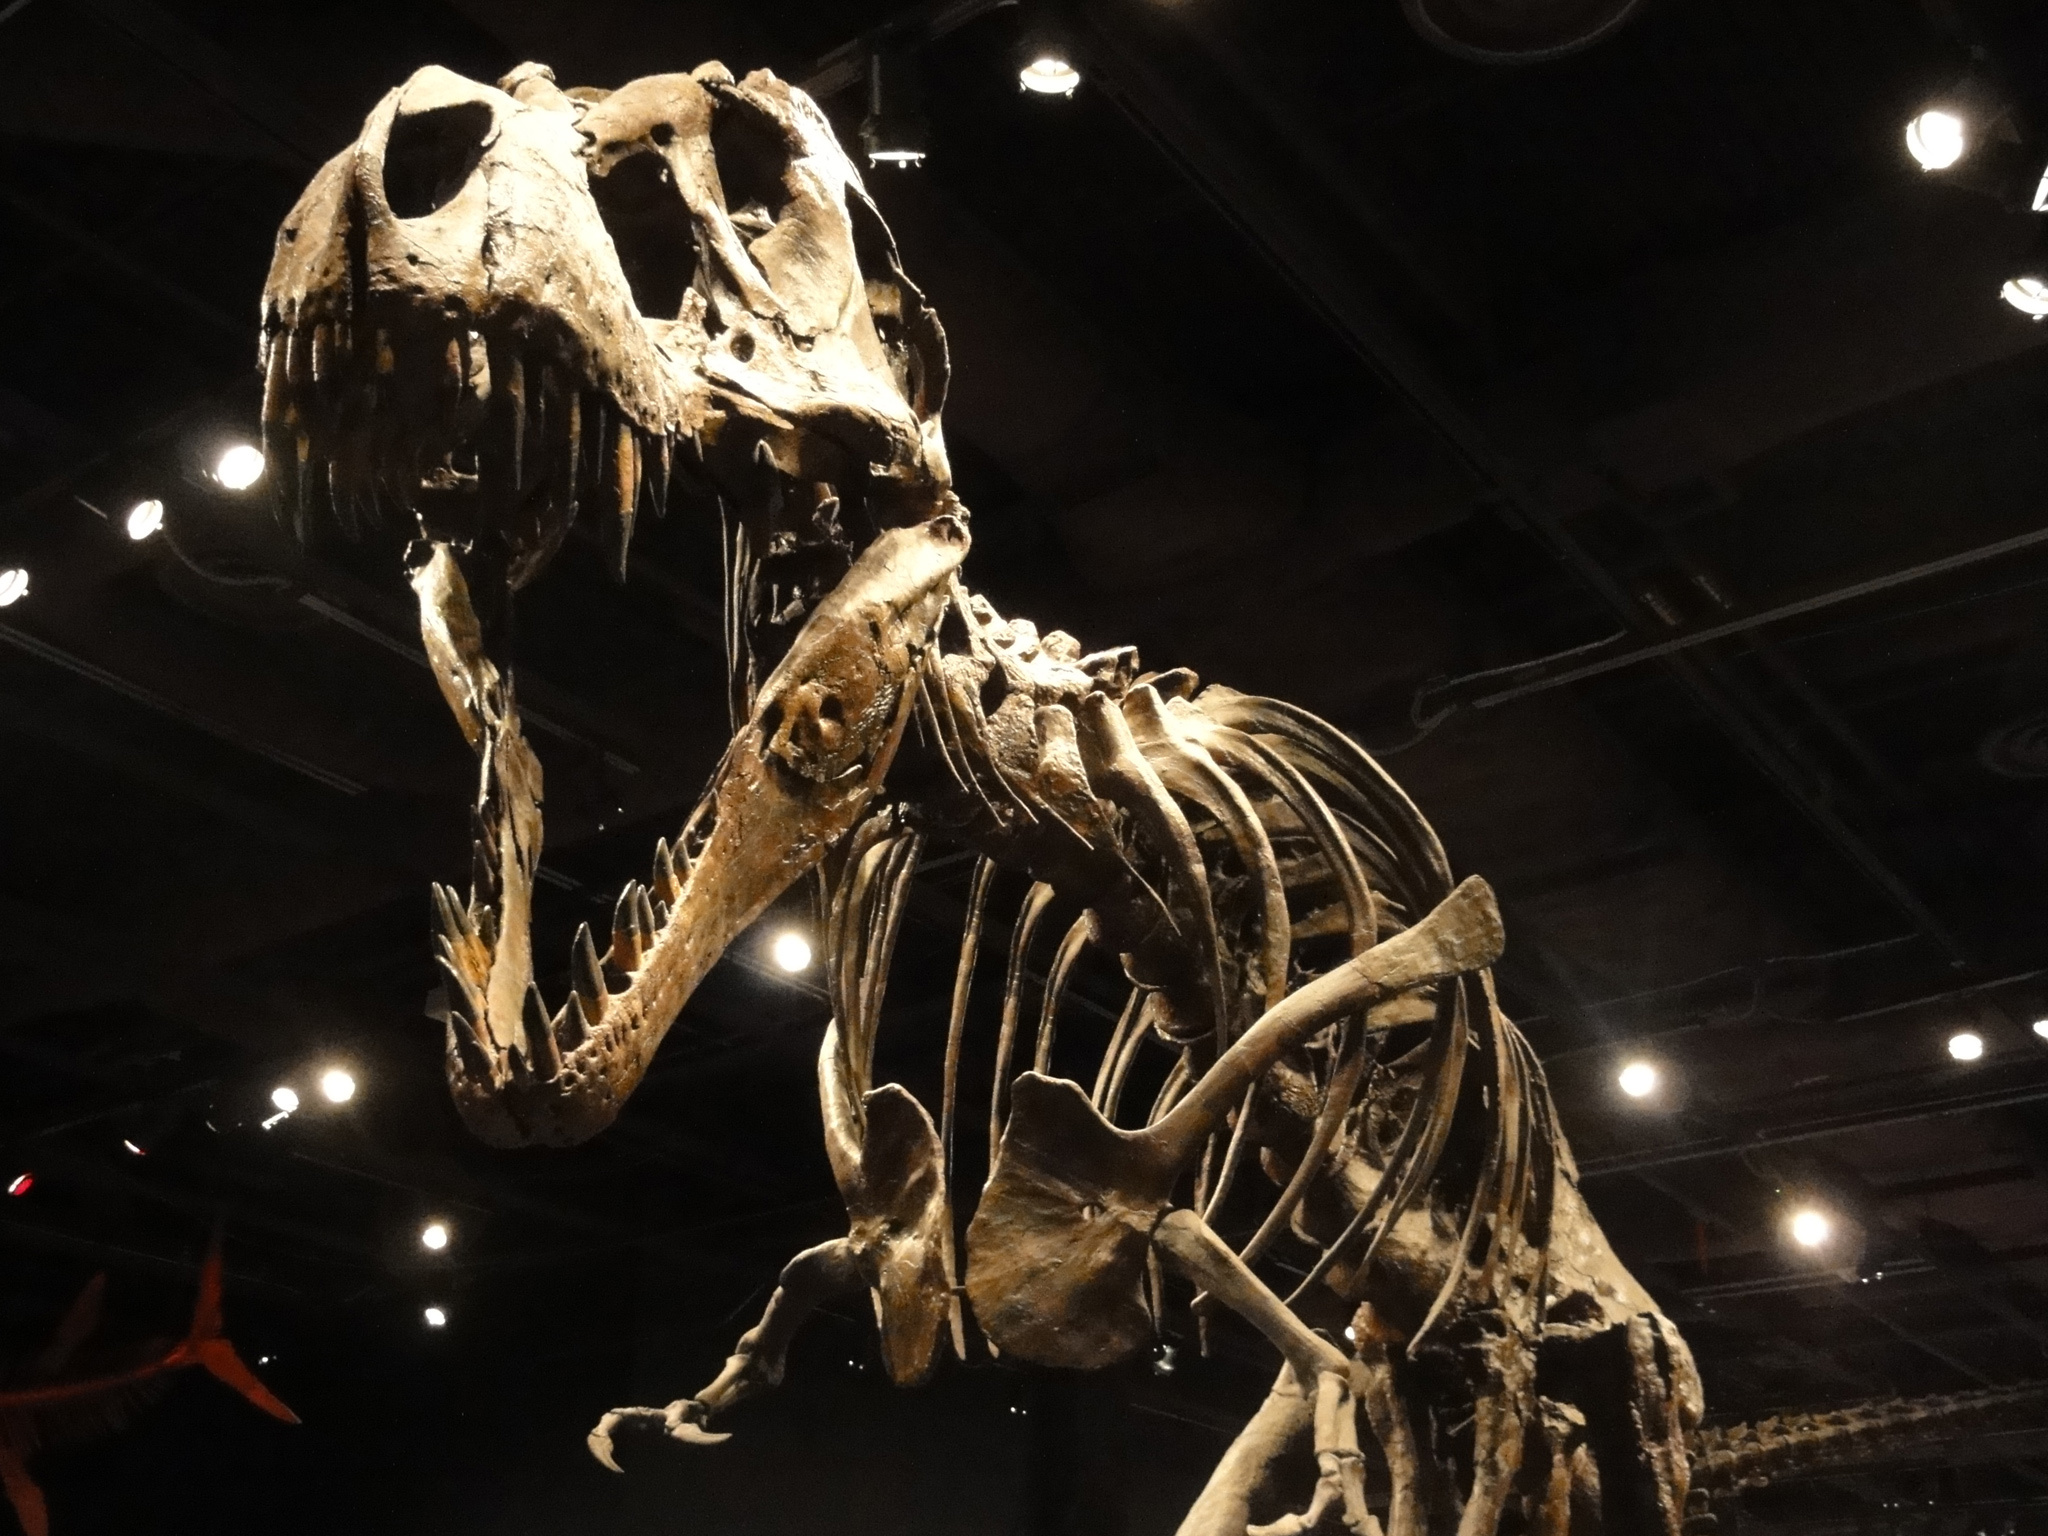 A dinosaur exhibit at Orlando Science Center